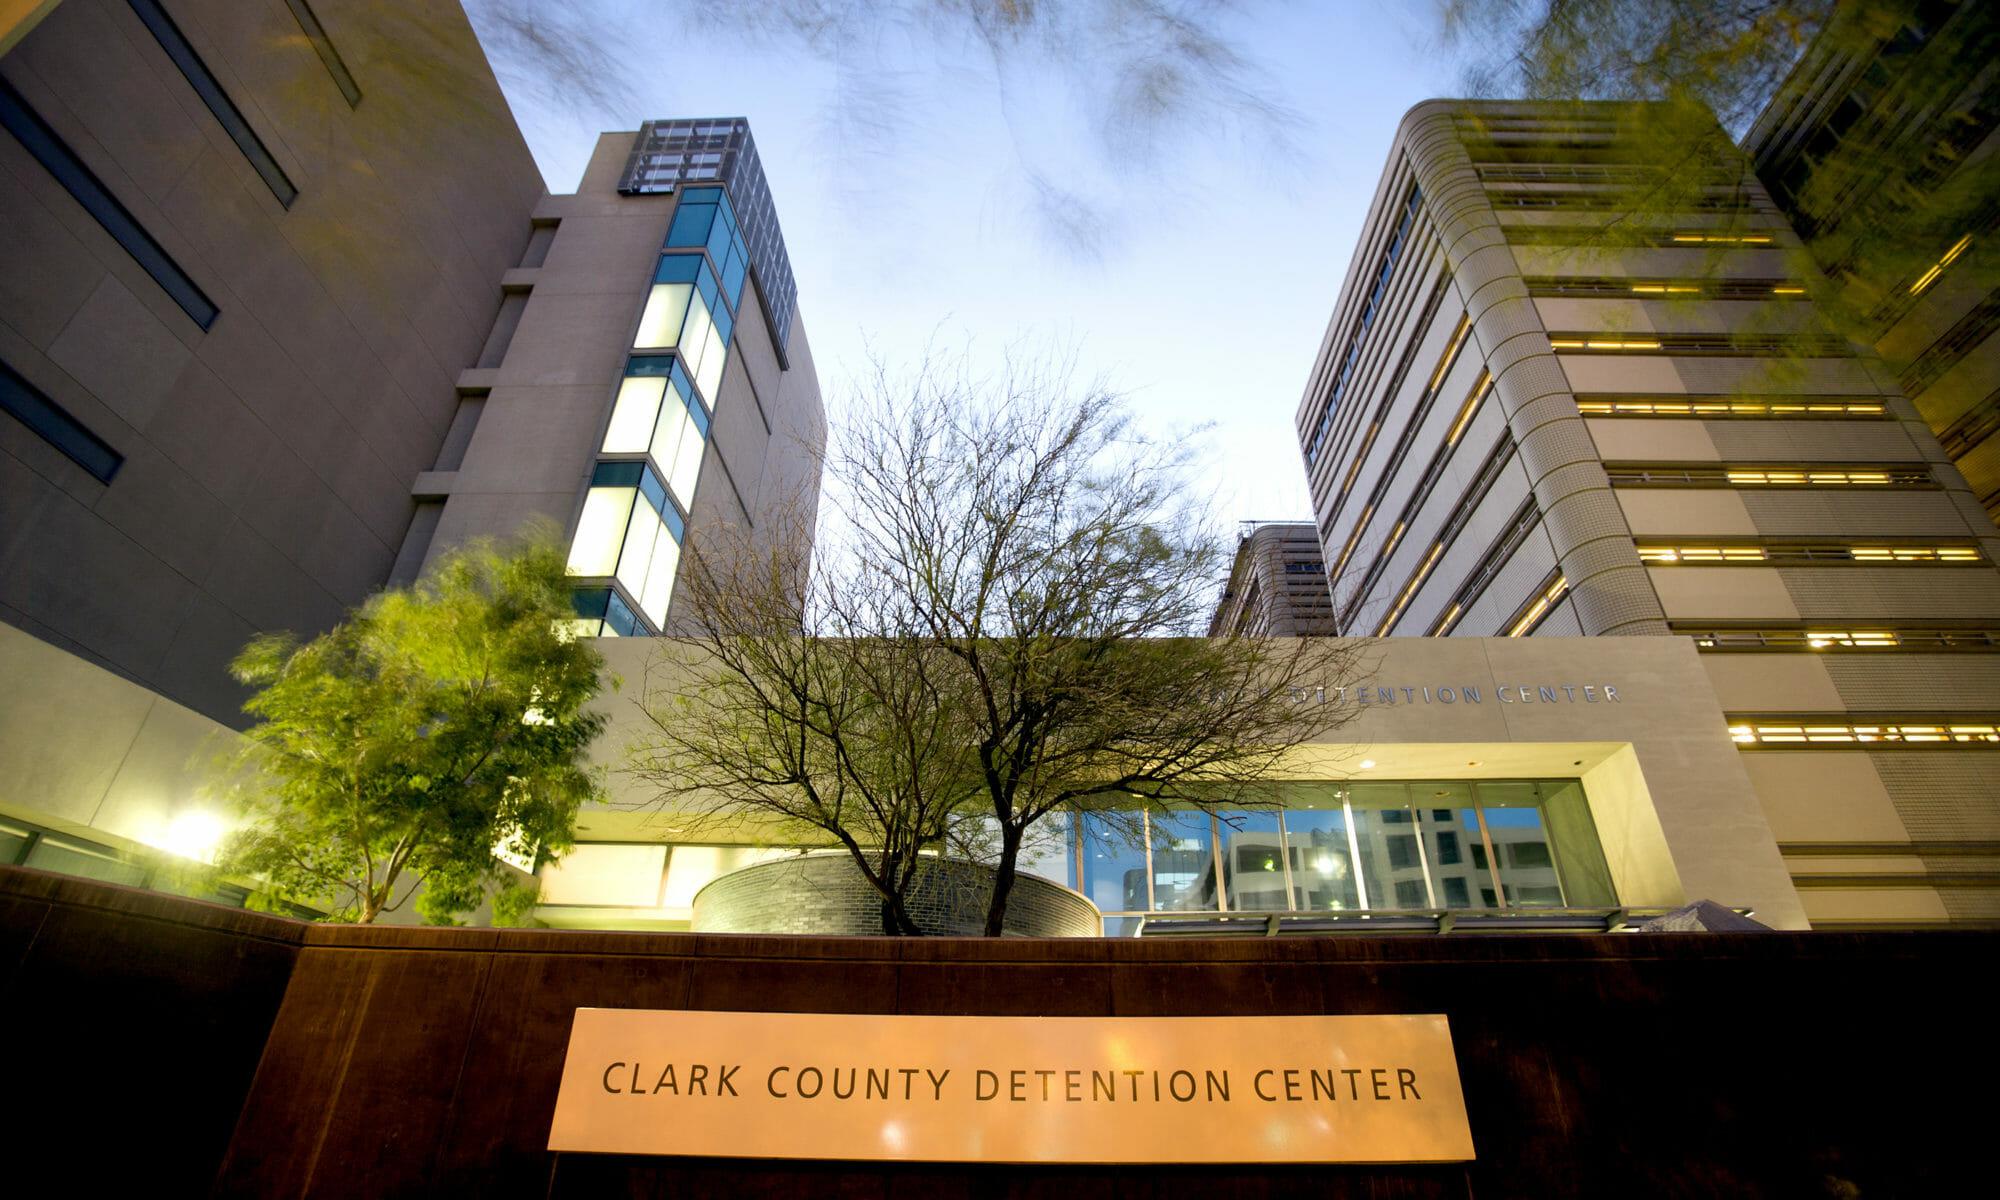 Clark County Detention Center building at dusk